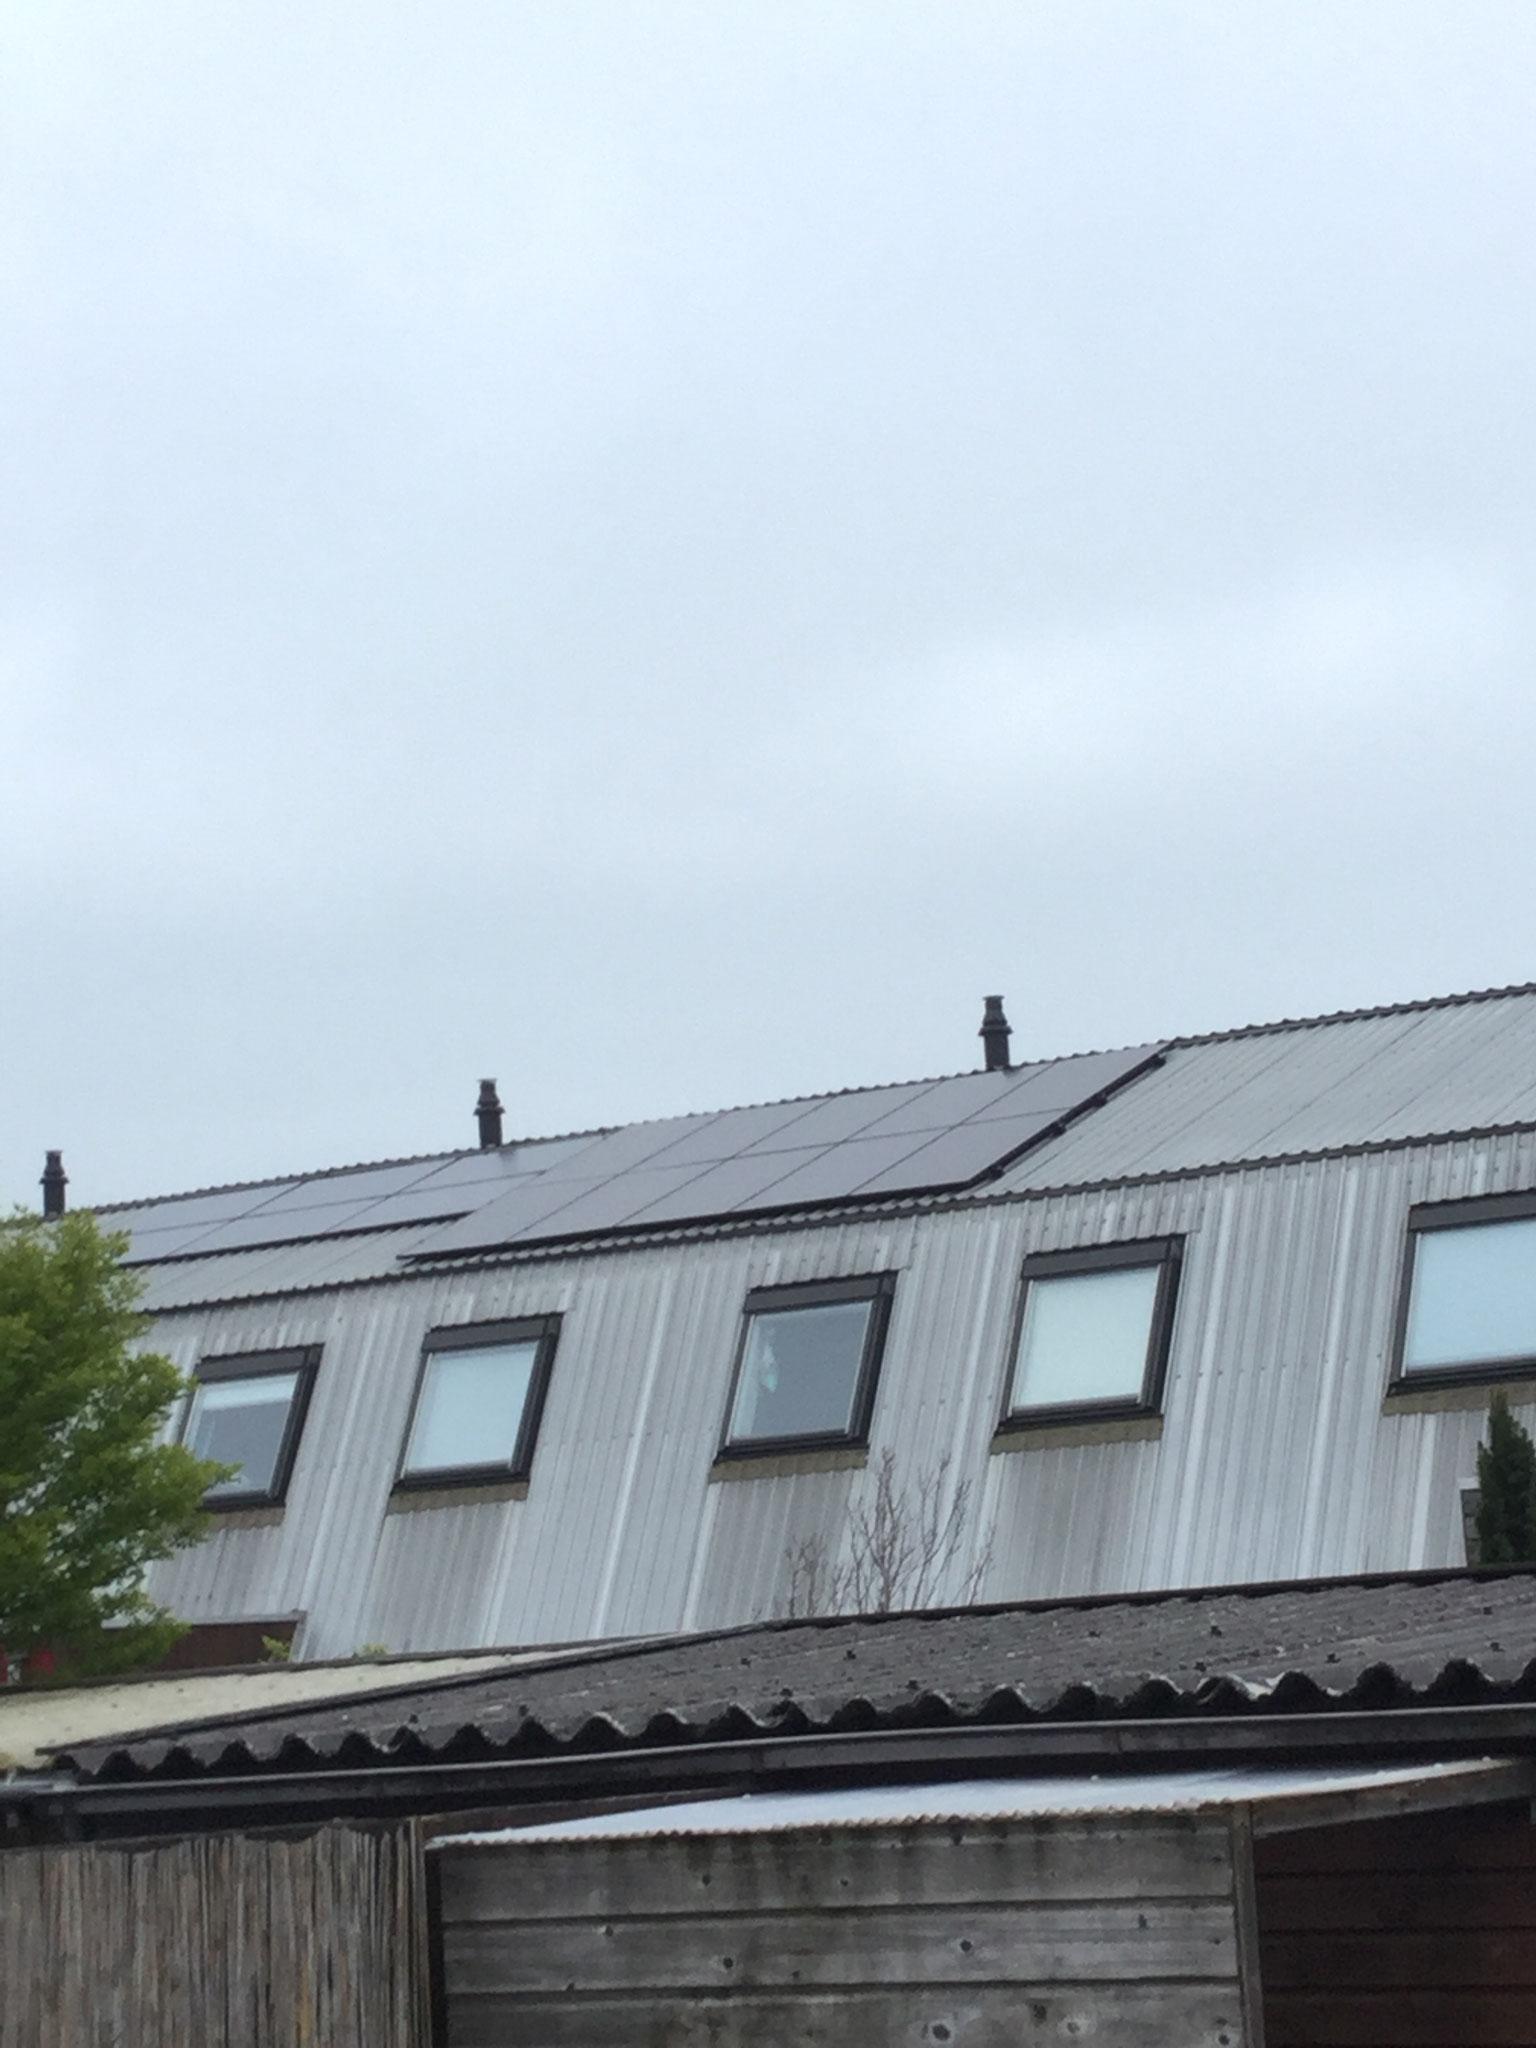 Groningen, 10 panelen